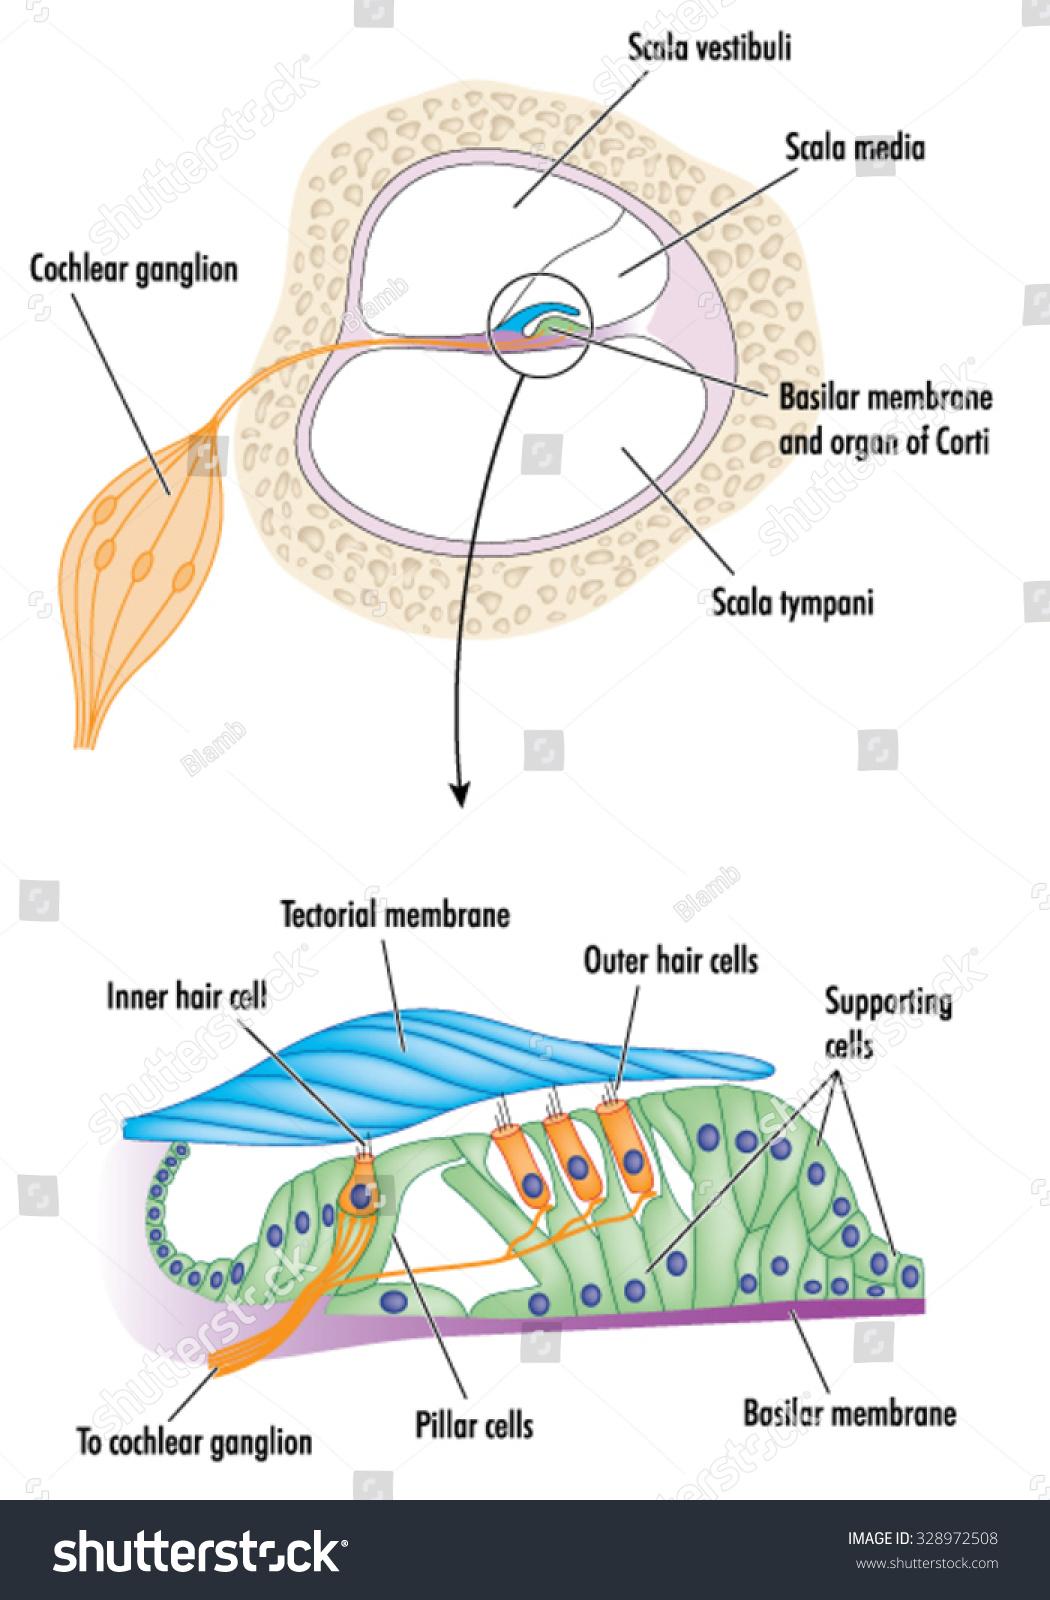 Organ of corti model